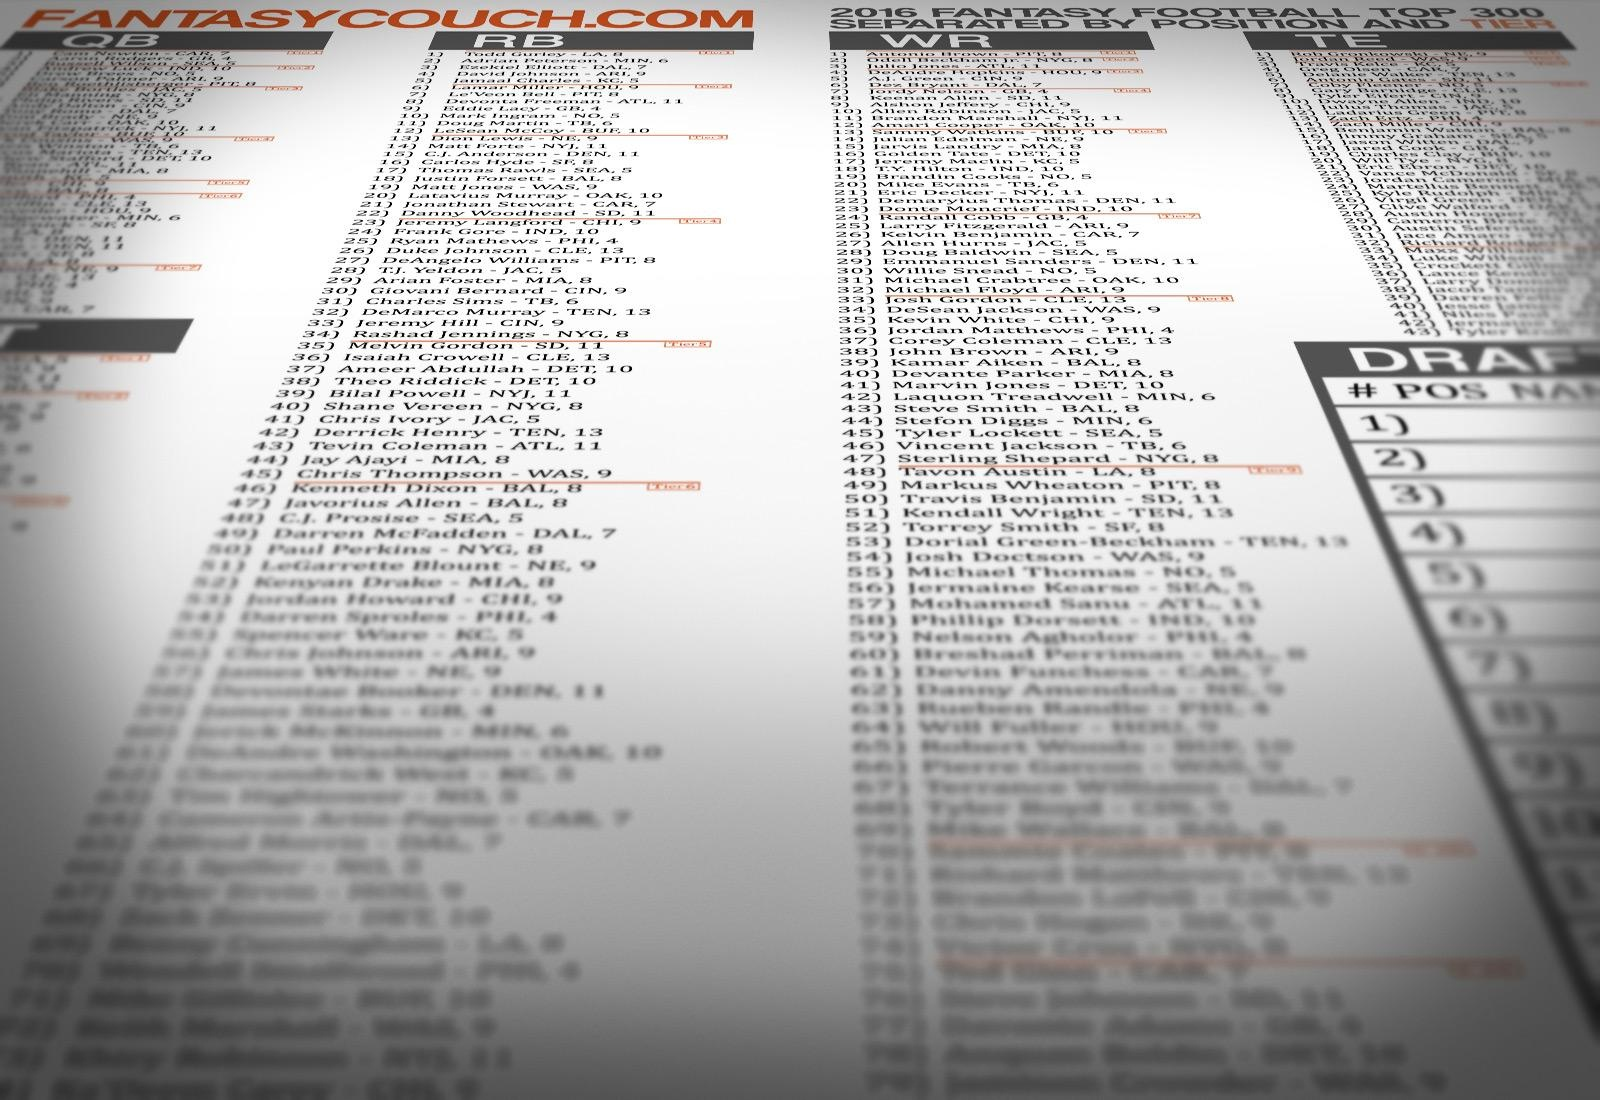 Top 300 List - Fantasy Football 2018 Cheat Sheet - Free Printable Fantasy Football Cheat Sheets